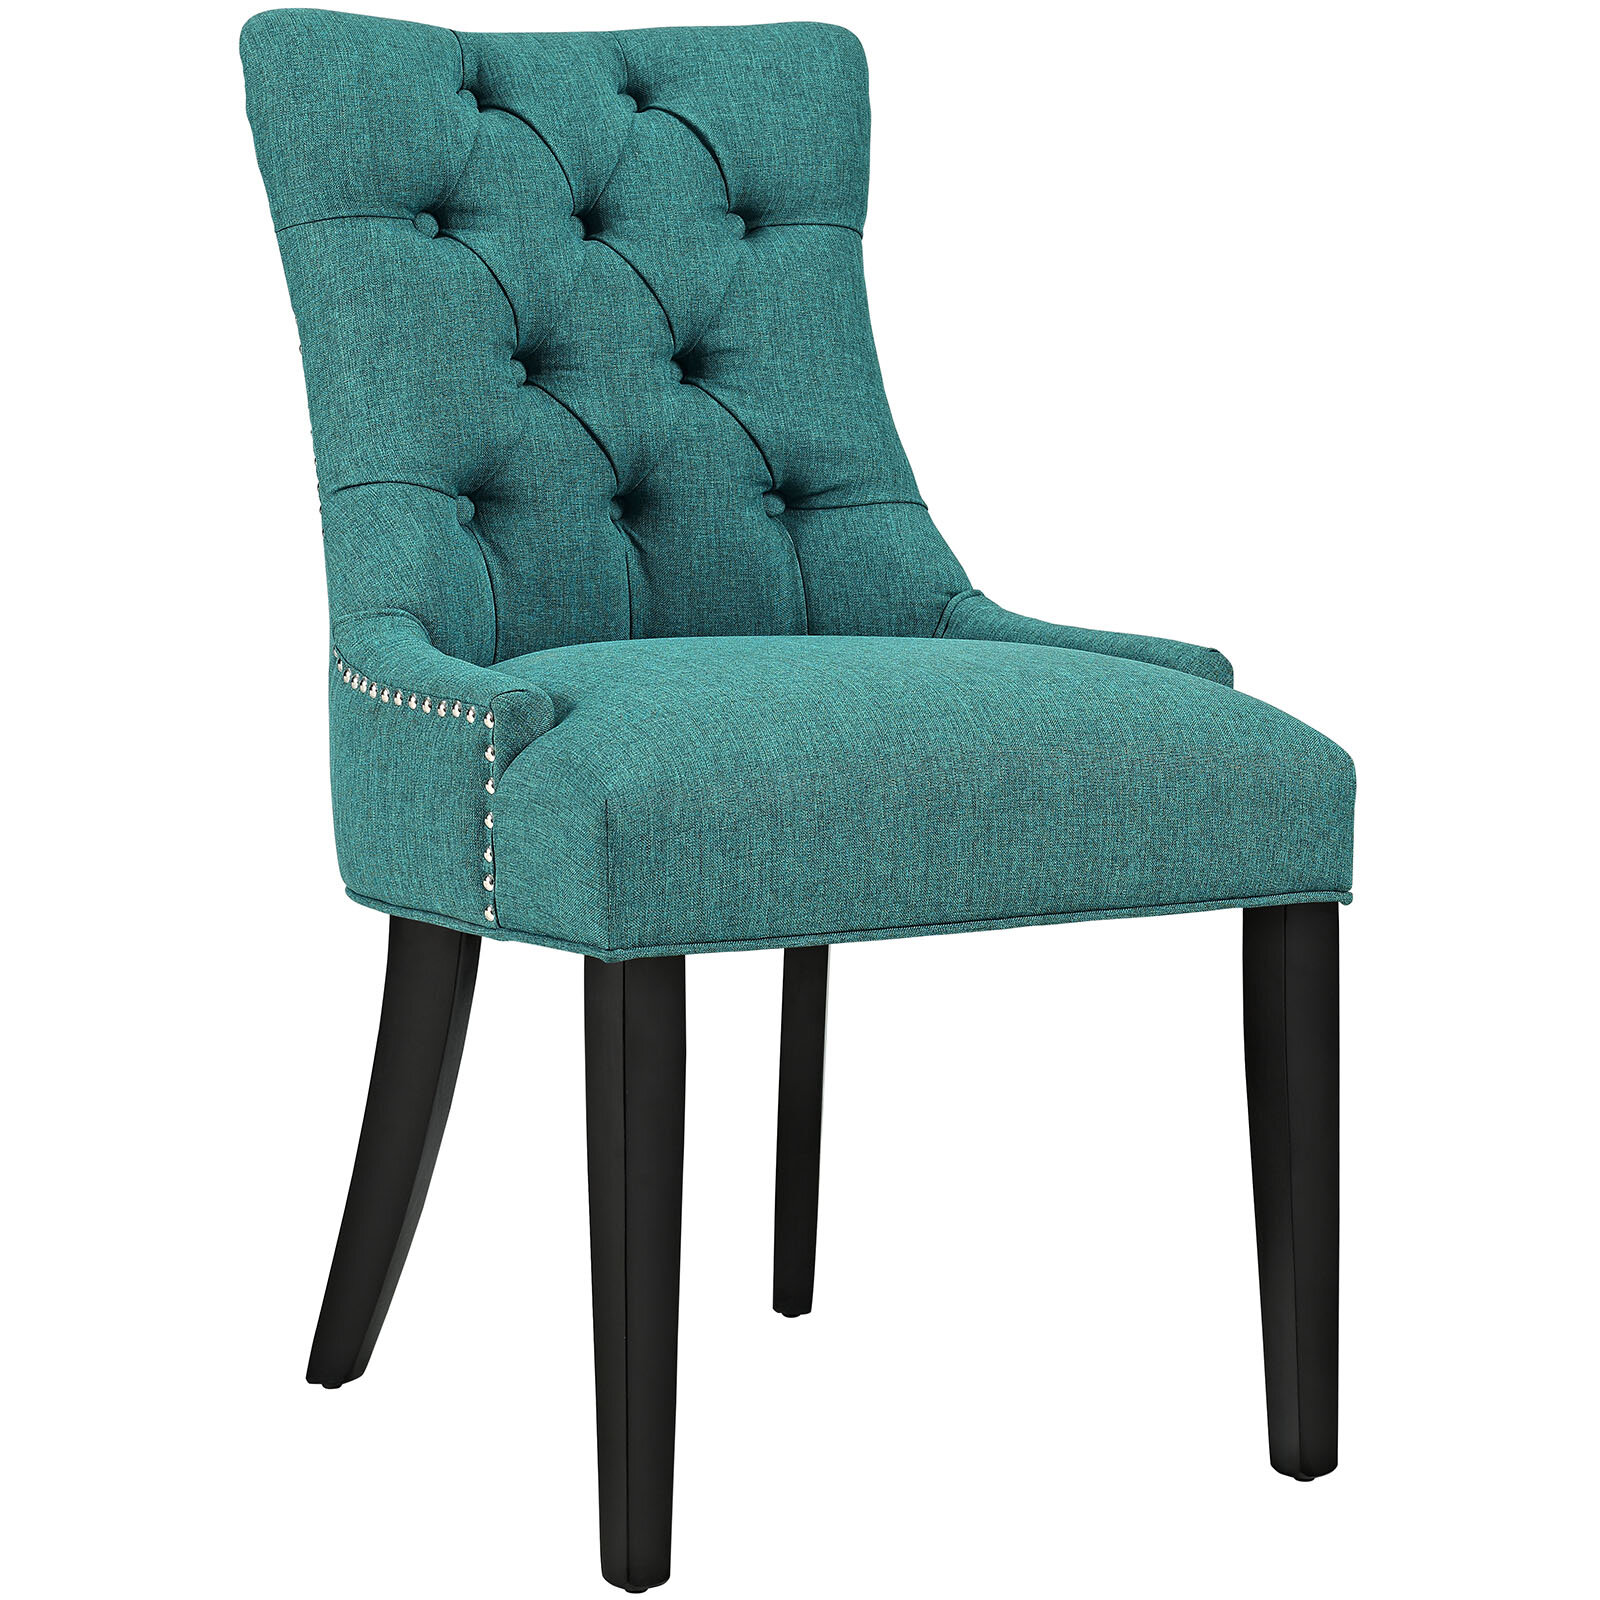 Modway Regent Upholstered Dining Chair & Reviews | Wayfair